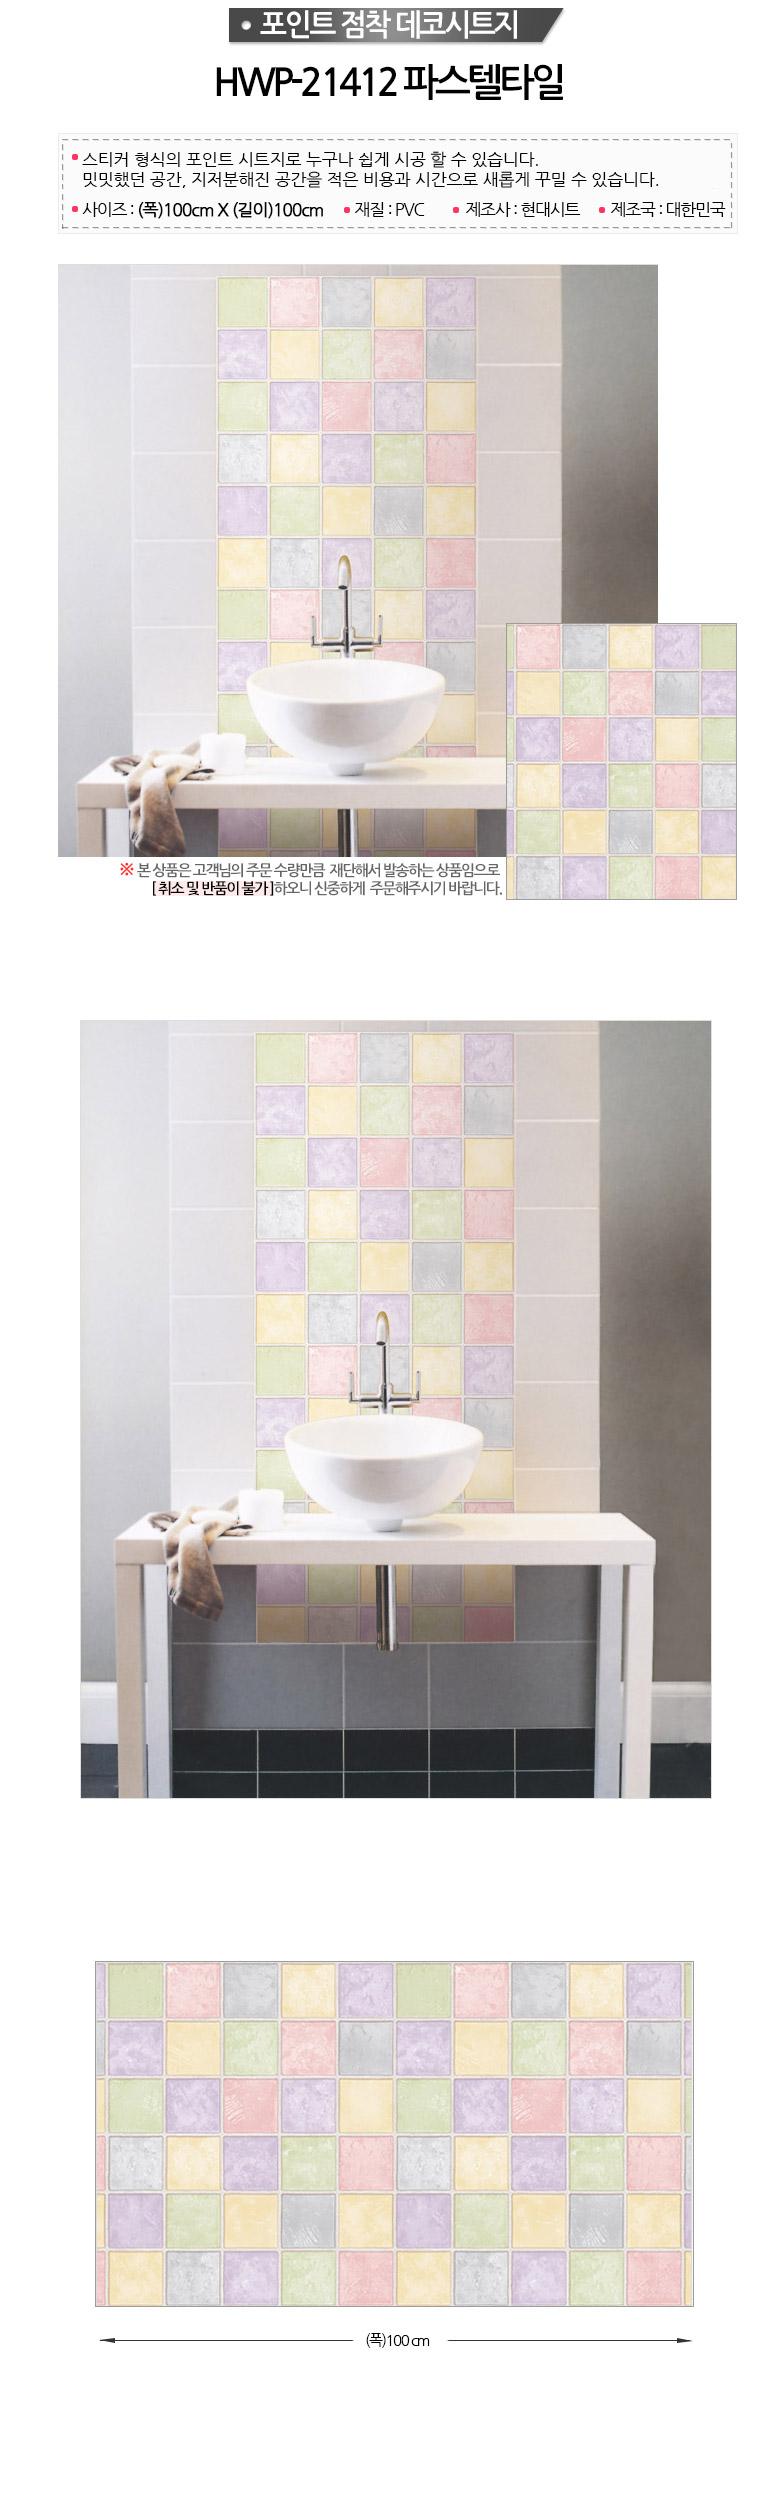 HWP-21412 프란시스2 - 케이알인터내셔날, 7,700원, 벽지/시트지, 단색벽지